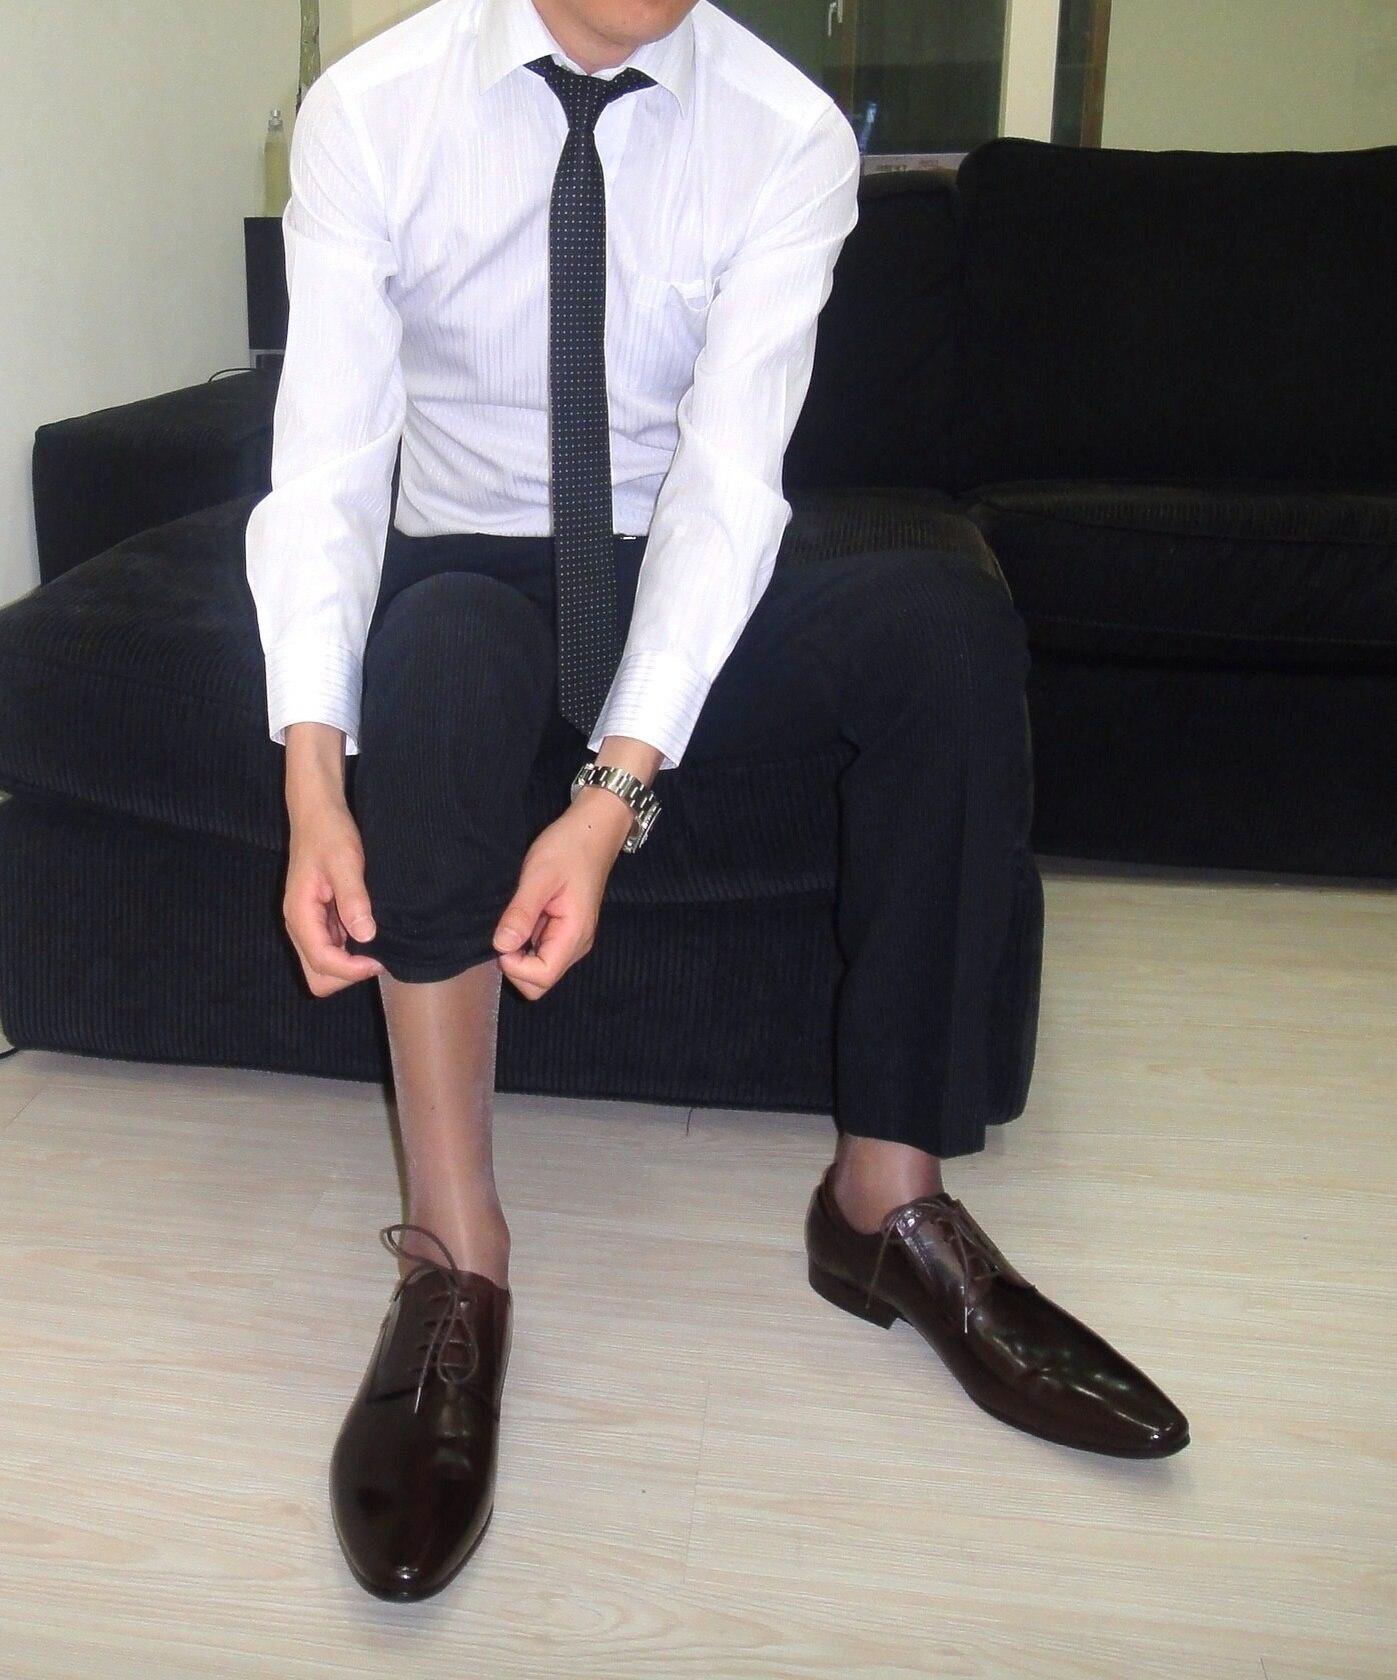 2017 male sexy men socks gay underwear stocking men 39 s new for Men a porter